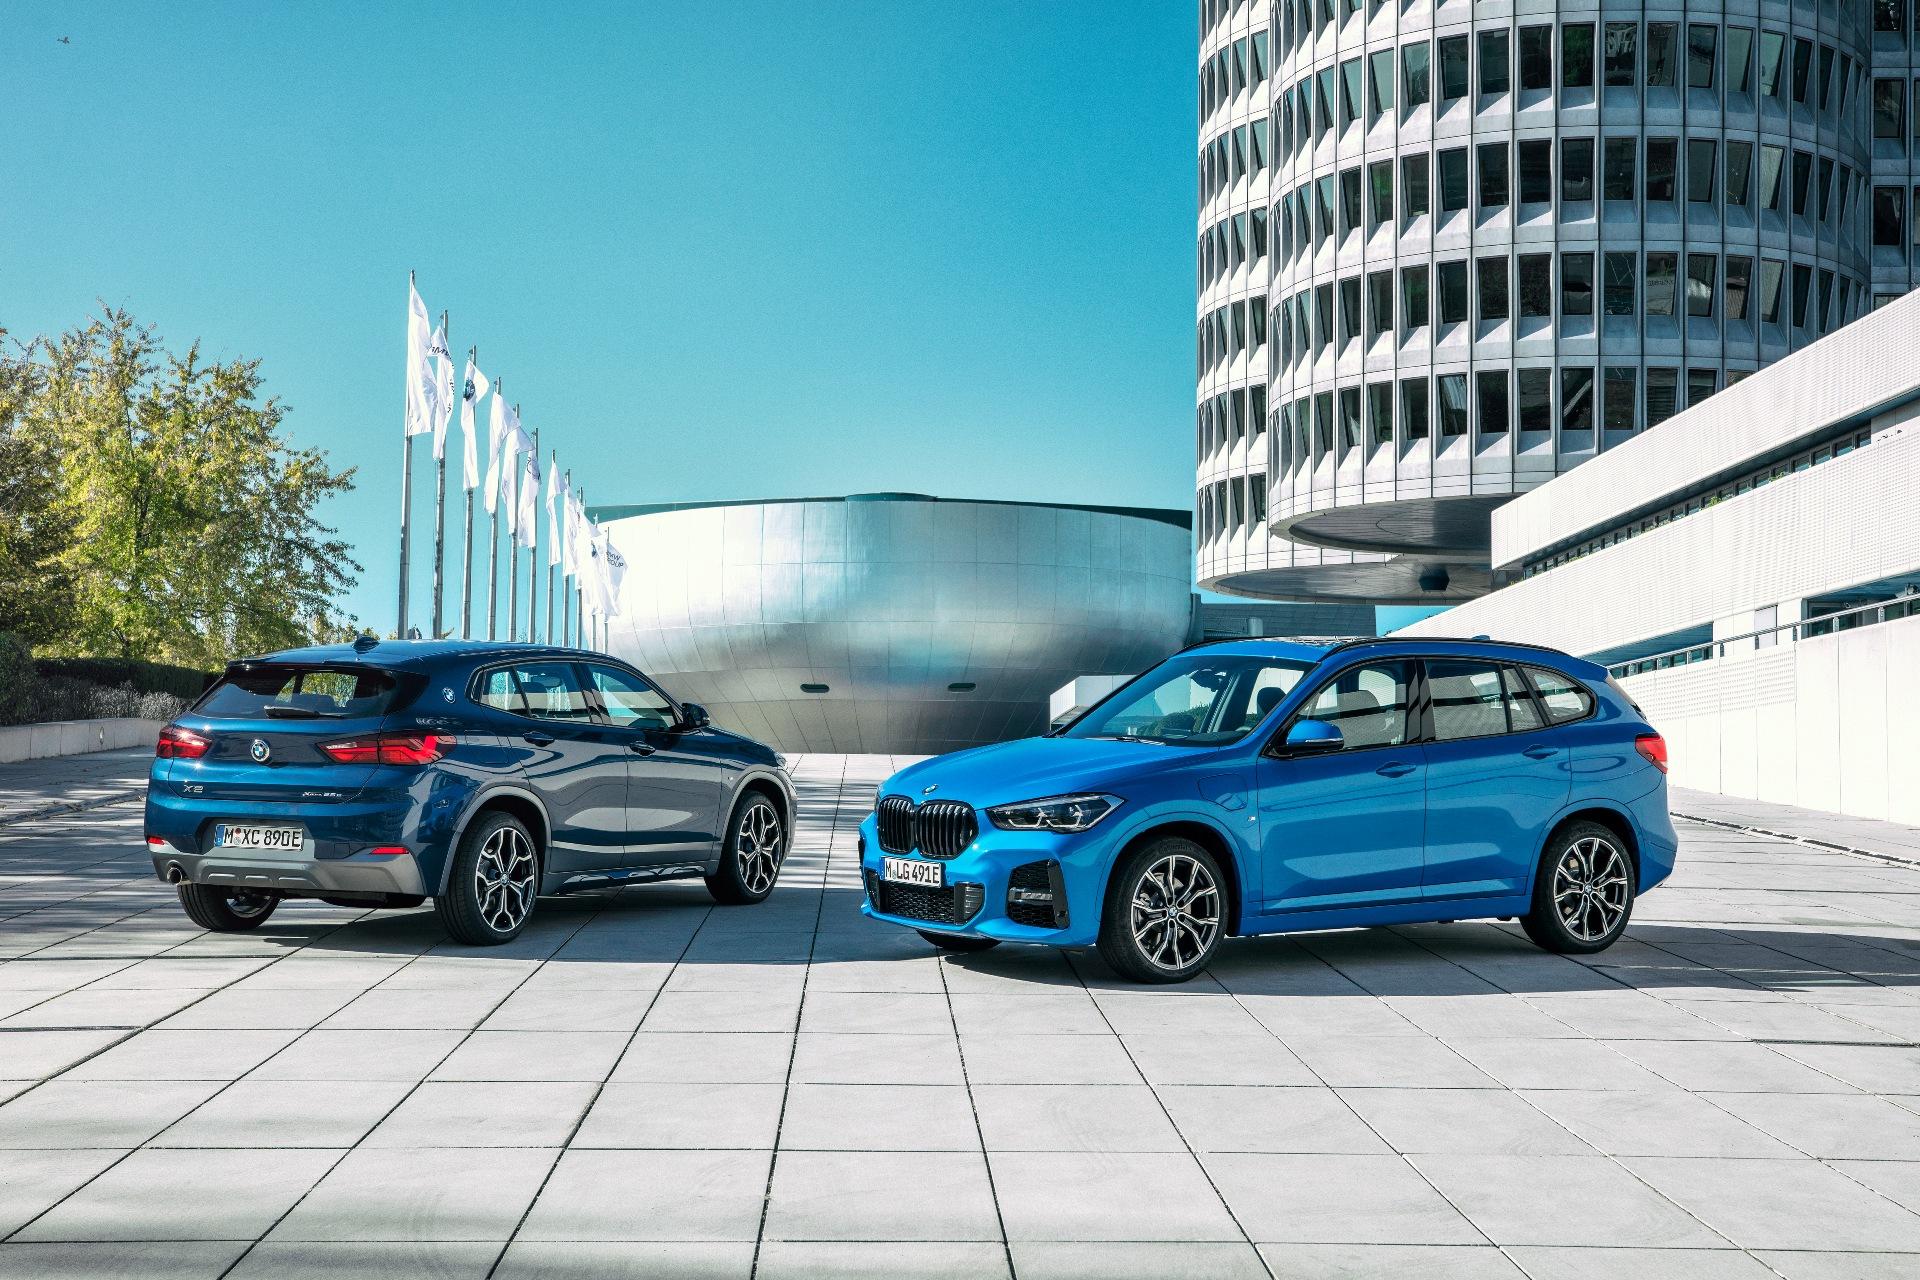 The new BMW X1 xDrive25 and X2 xDrive25e 2